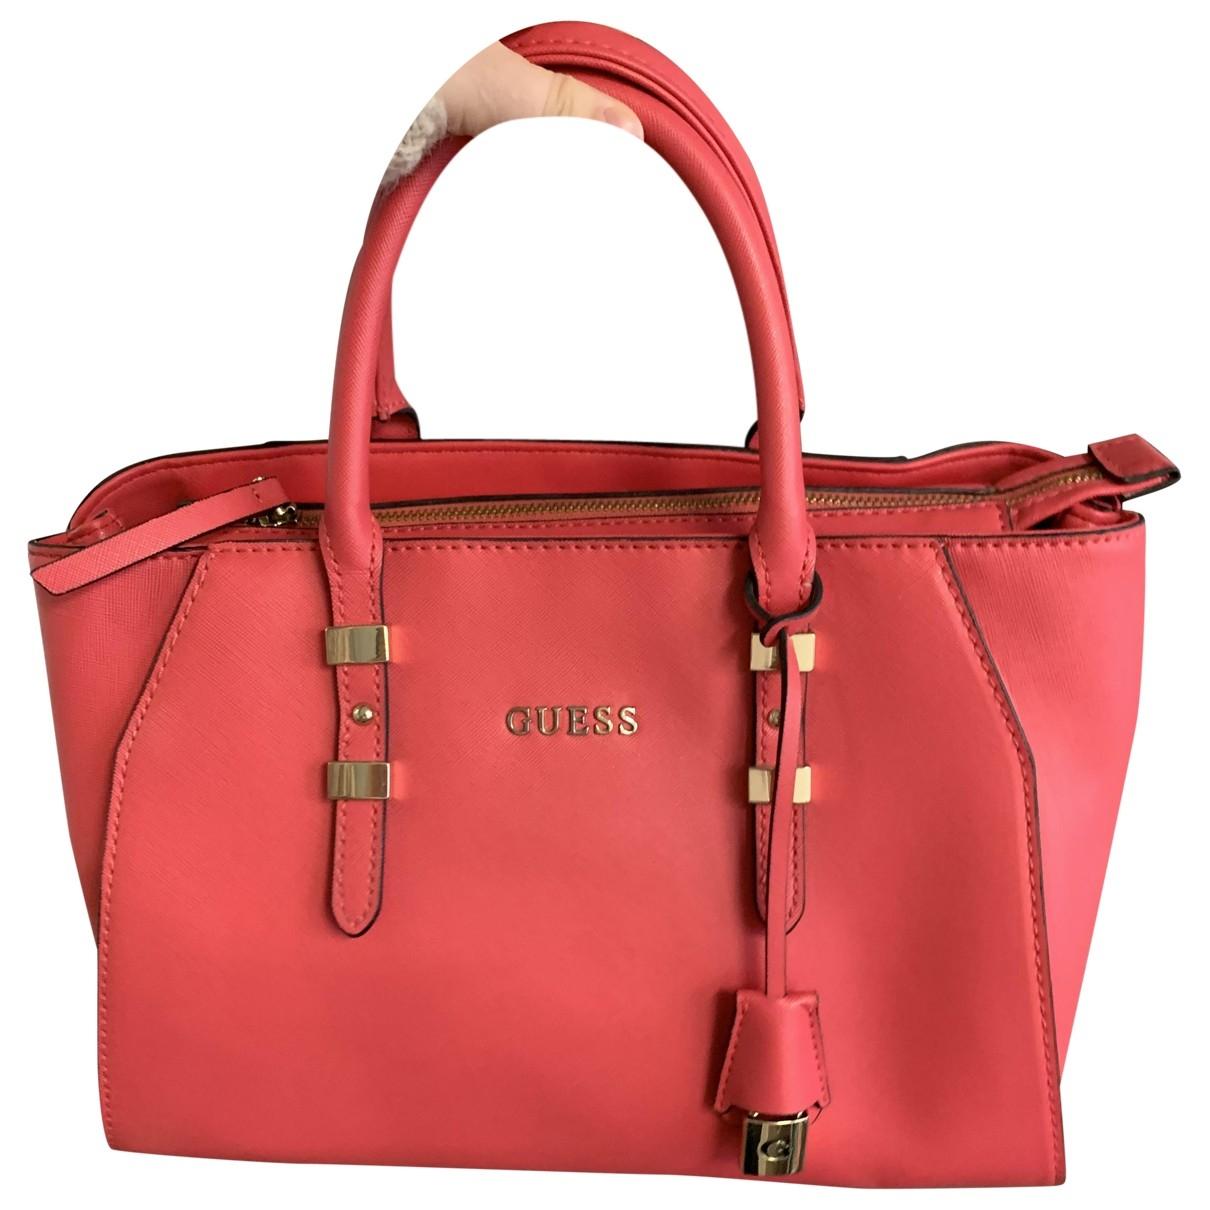 Guess \N Pink handbag for Women \N